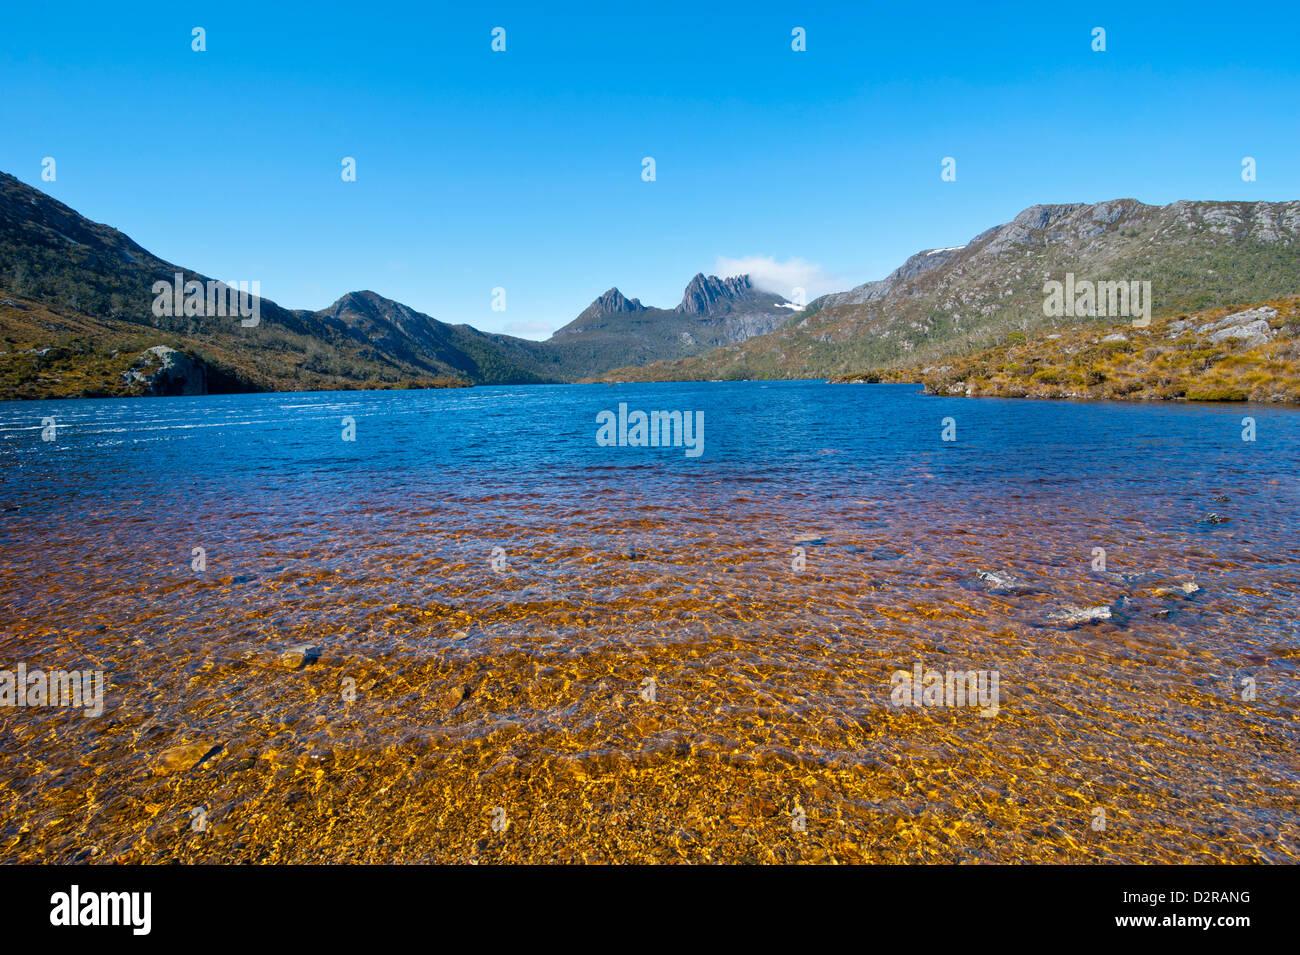 Dove Lake and Cradle Mountain, Cradle Mountain-Lake St. Clair National Park, Tasmania, Australia - Stock Image